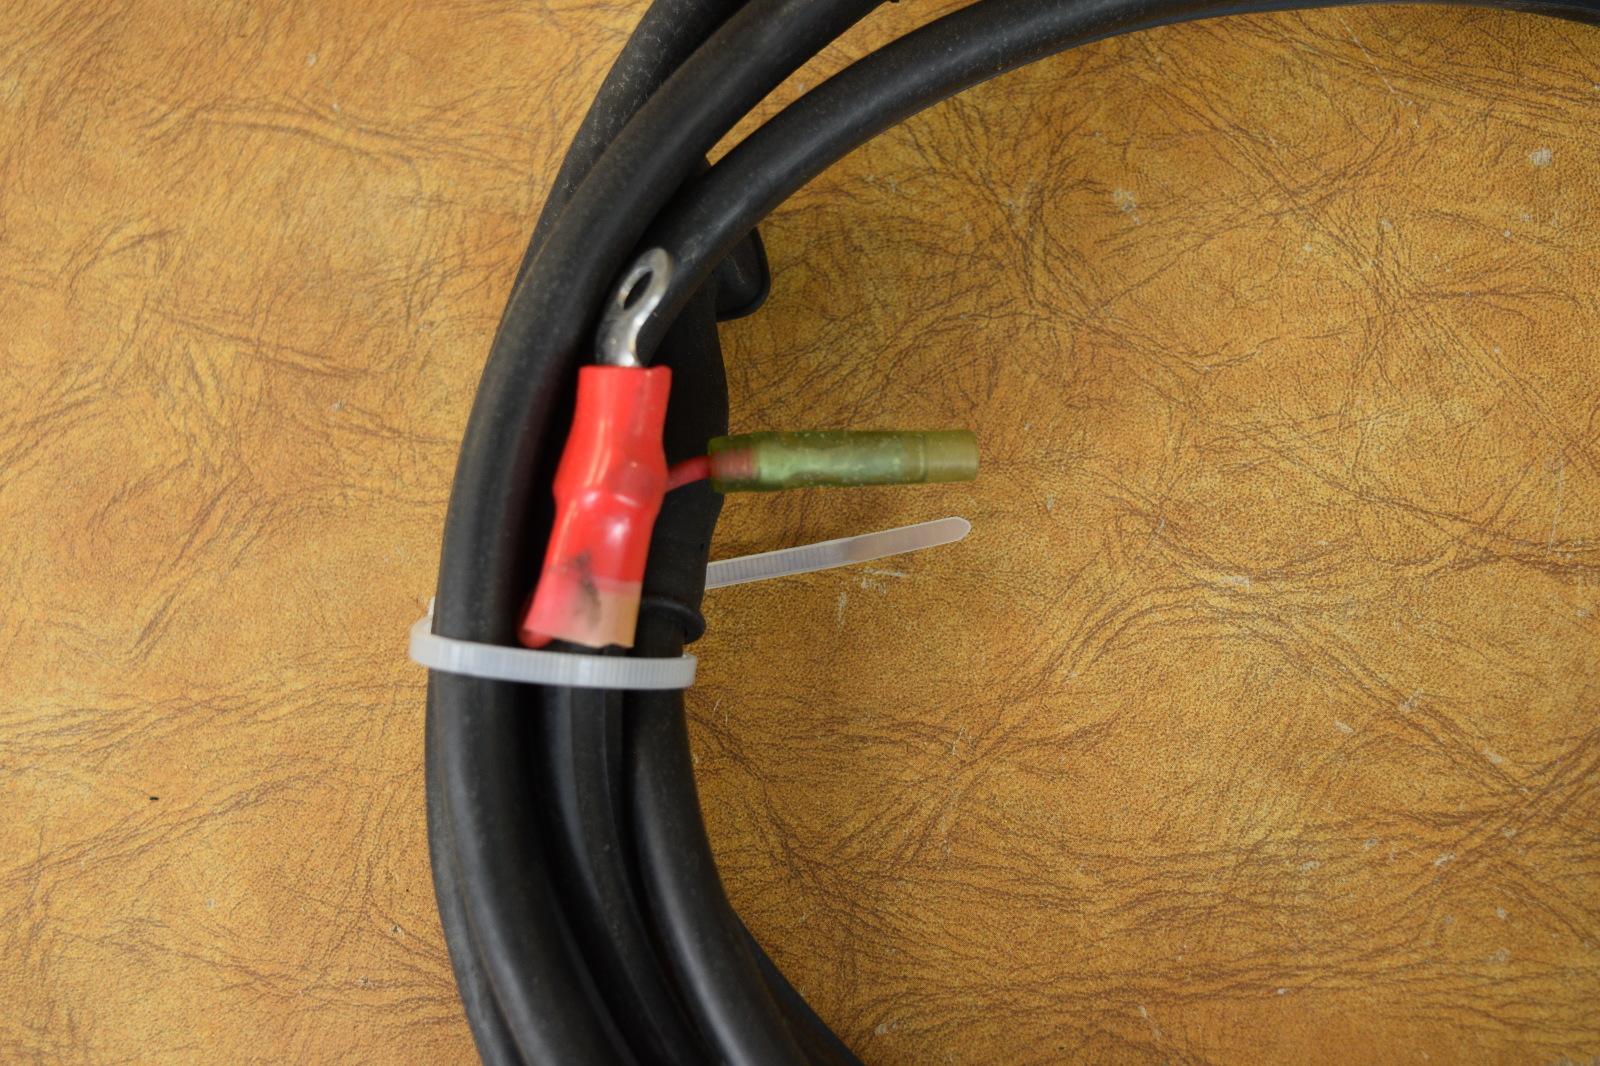 Suzuki Outboard Cables : Mercury johnson evinrude suzuki yamaha outboard battery